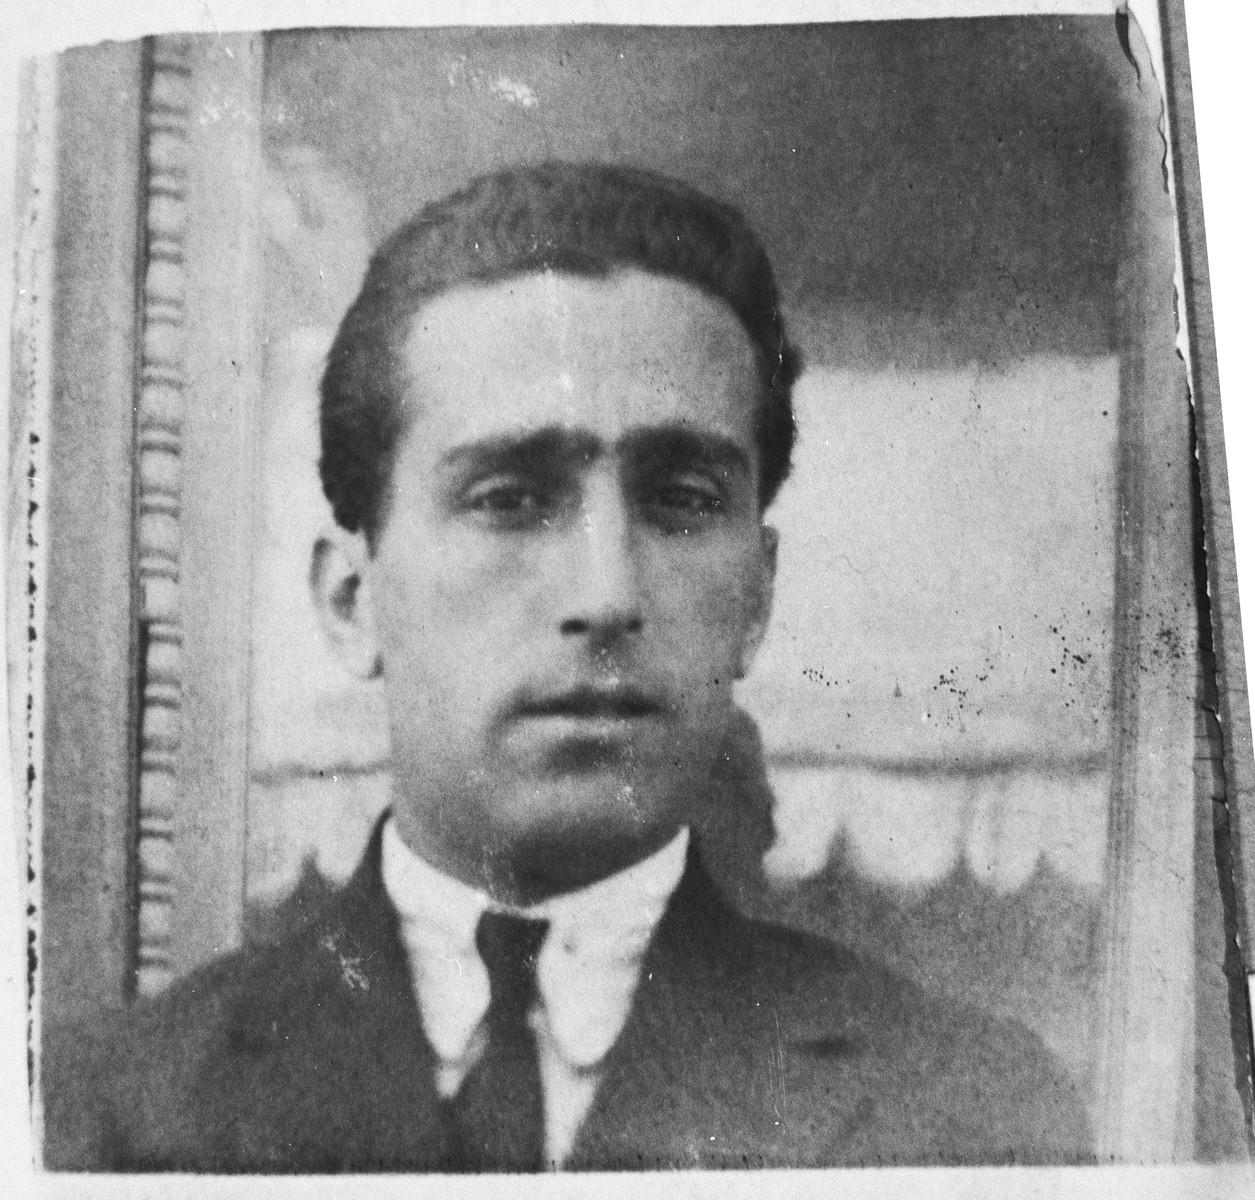 Portrait of Mair Aroesti, son of Avram Aroesti.  He was a second-hand dealer.  He lived on Zvornitska in Bitola.